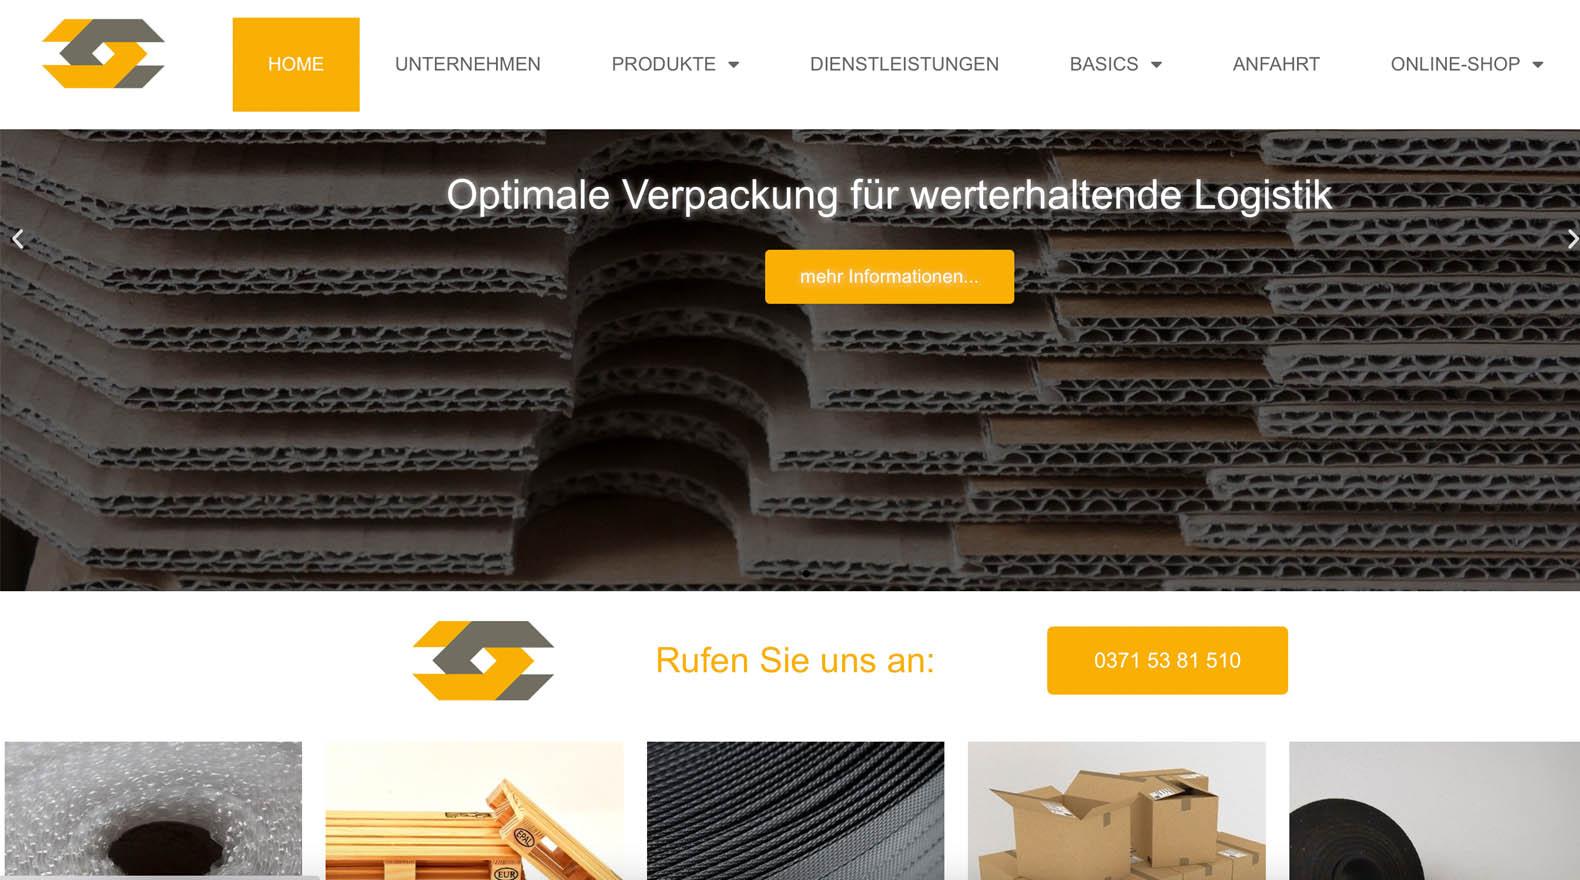 webprojekt-chemnitz-referenz-shop-verpackunge-müller